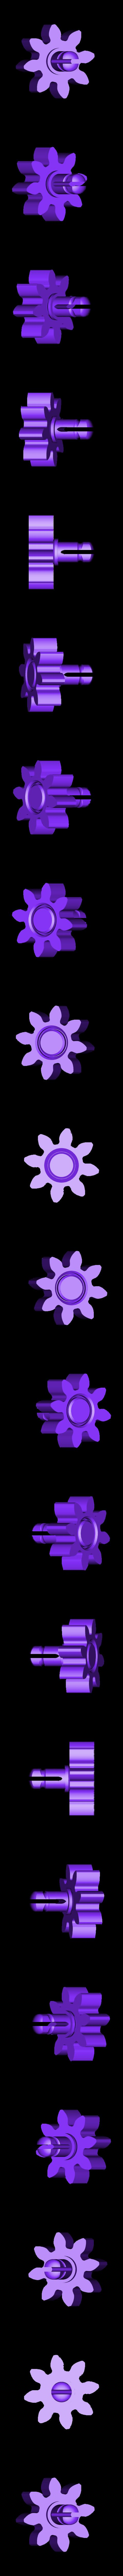 GEAR-IDLER_R2.stl Download free STL file Math Gear(s) • 3D print design, WorksBySolo